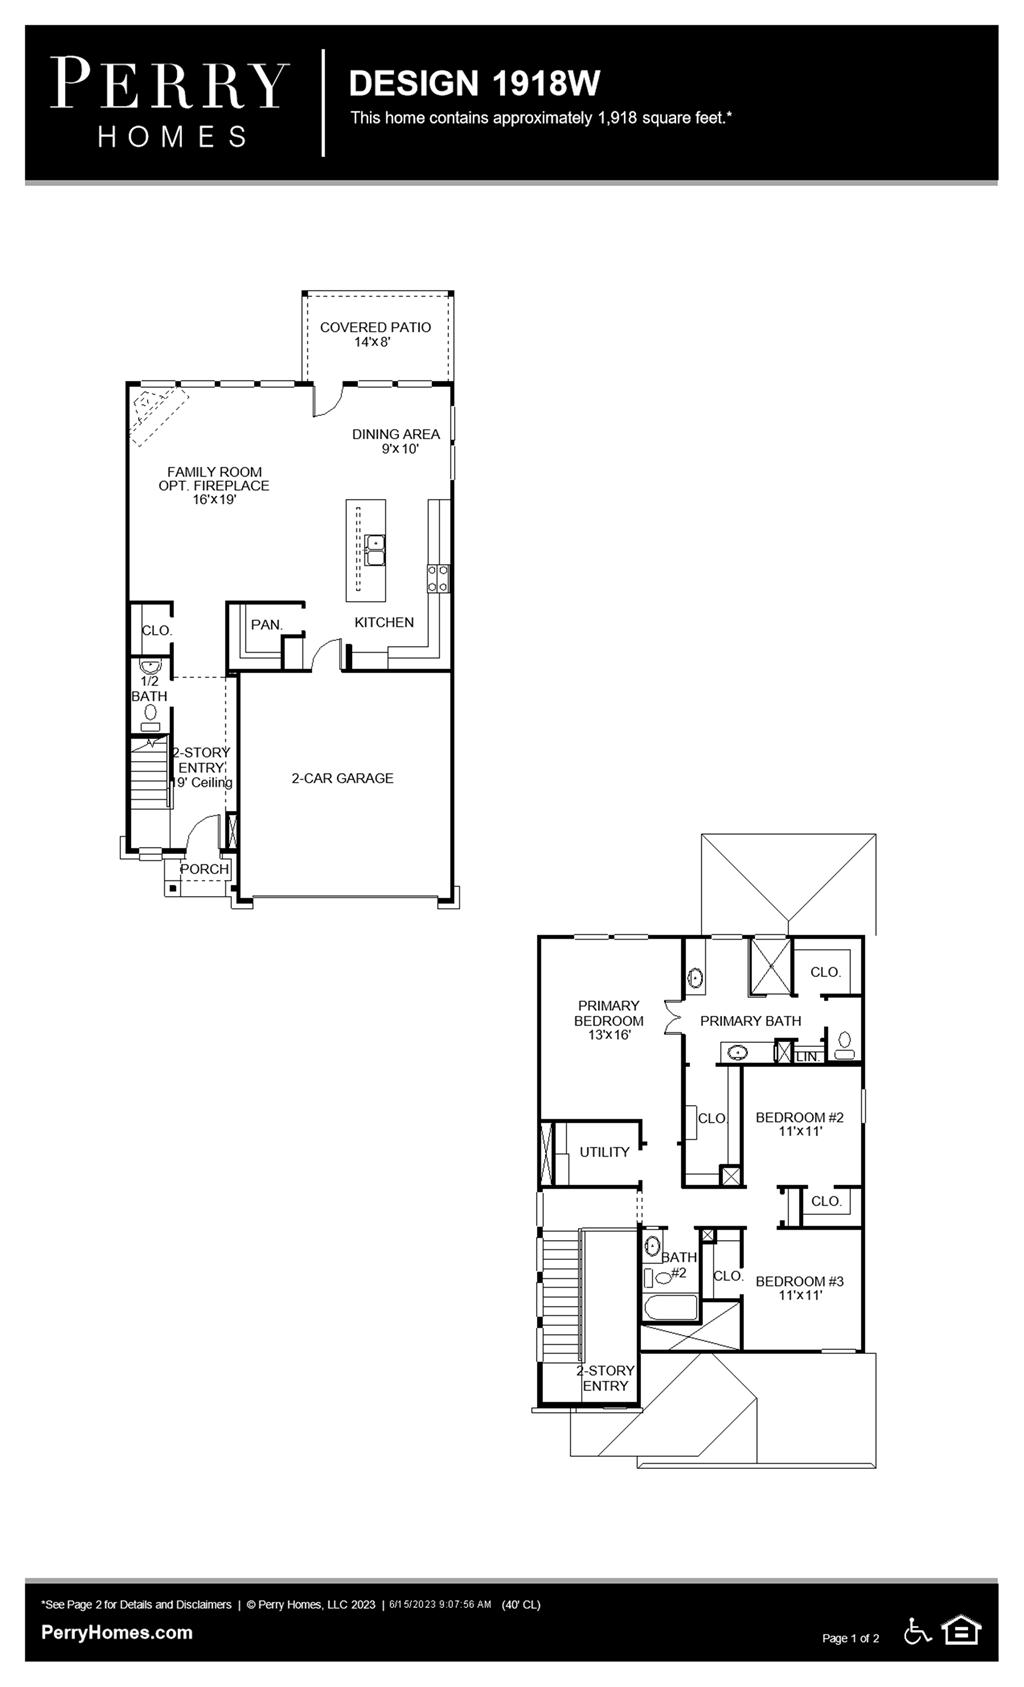 Floor Plan for 1918W